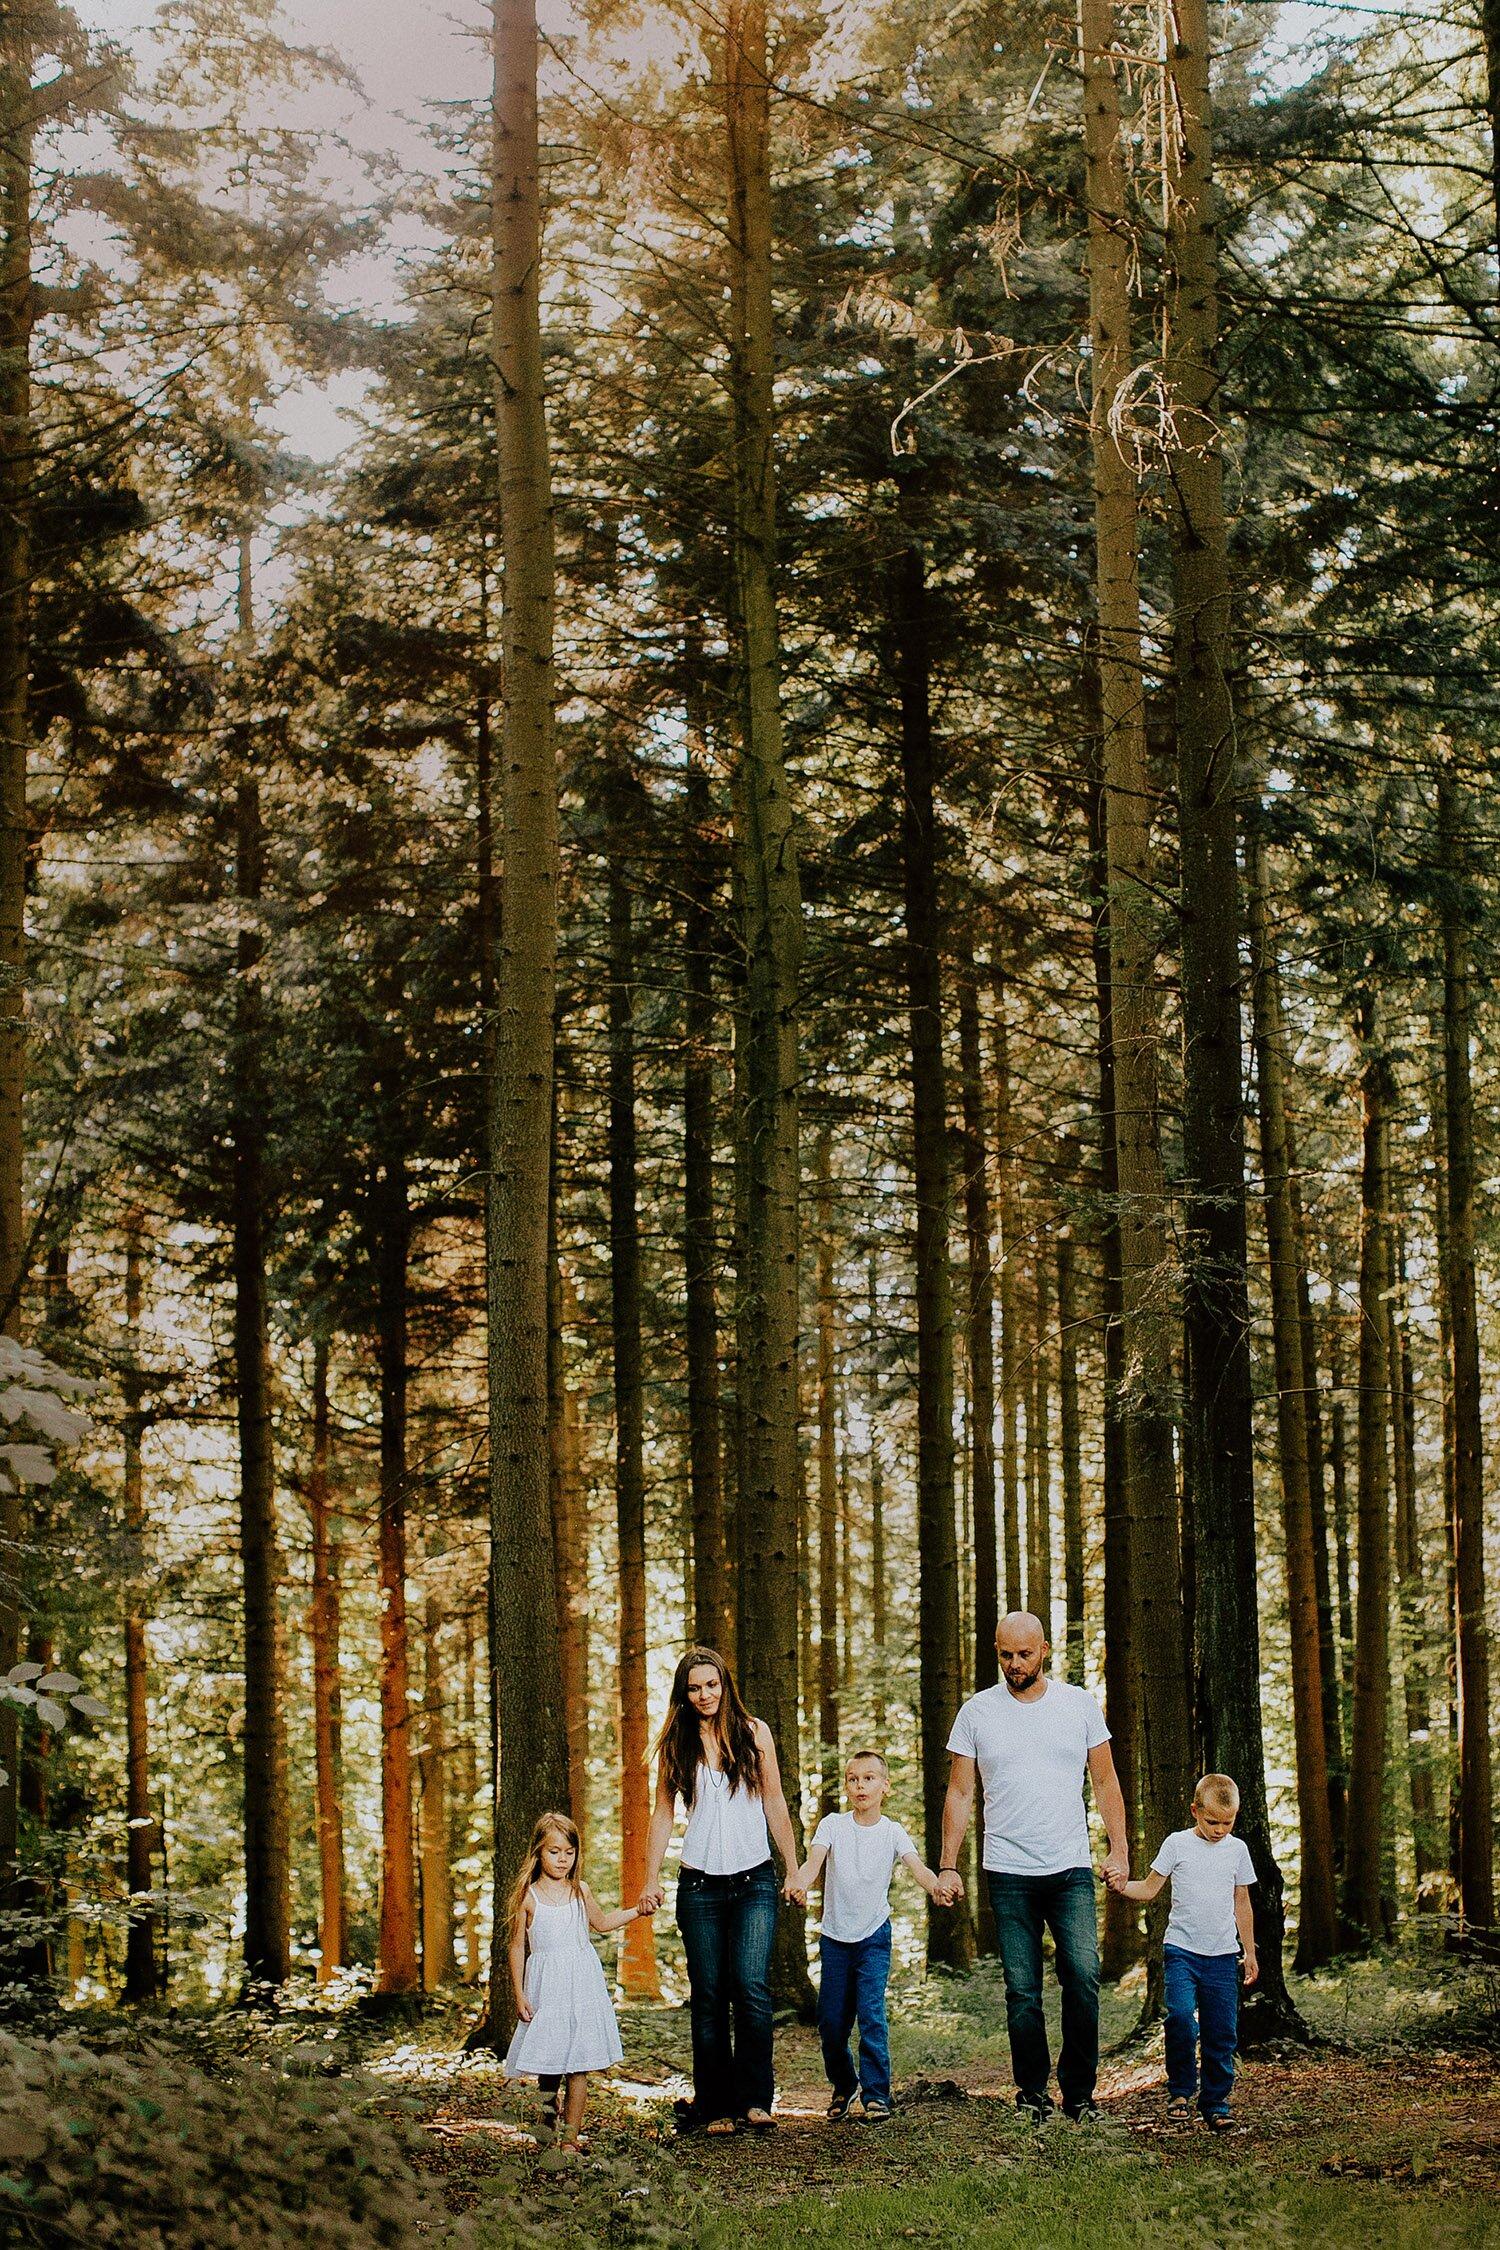 sesja rodzinna naturalna w lesie 19